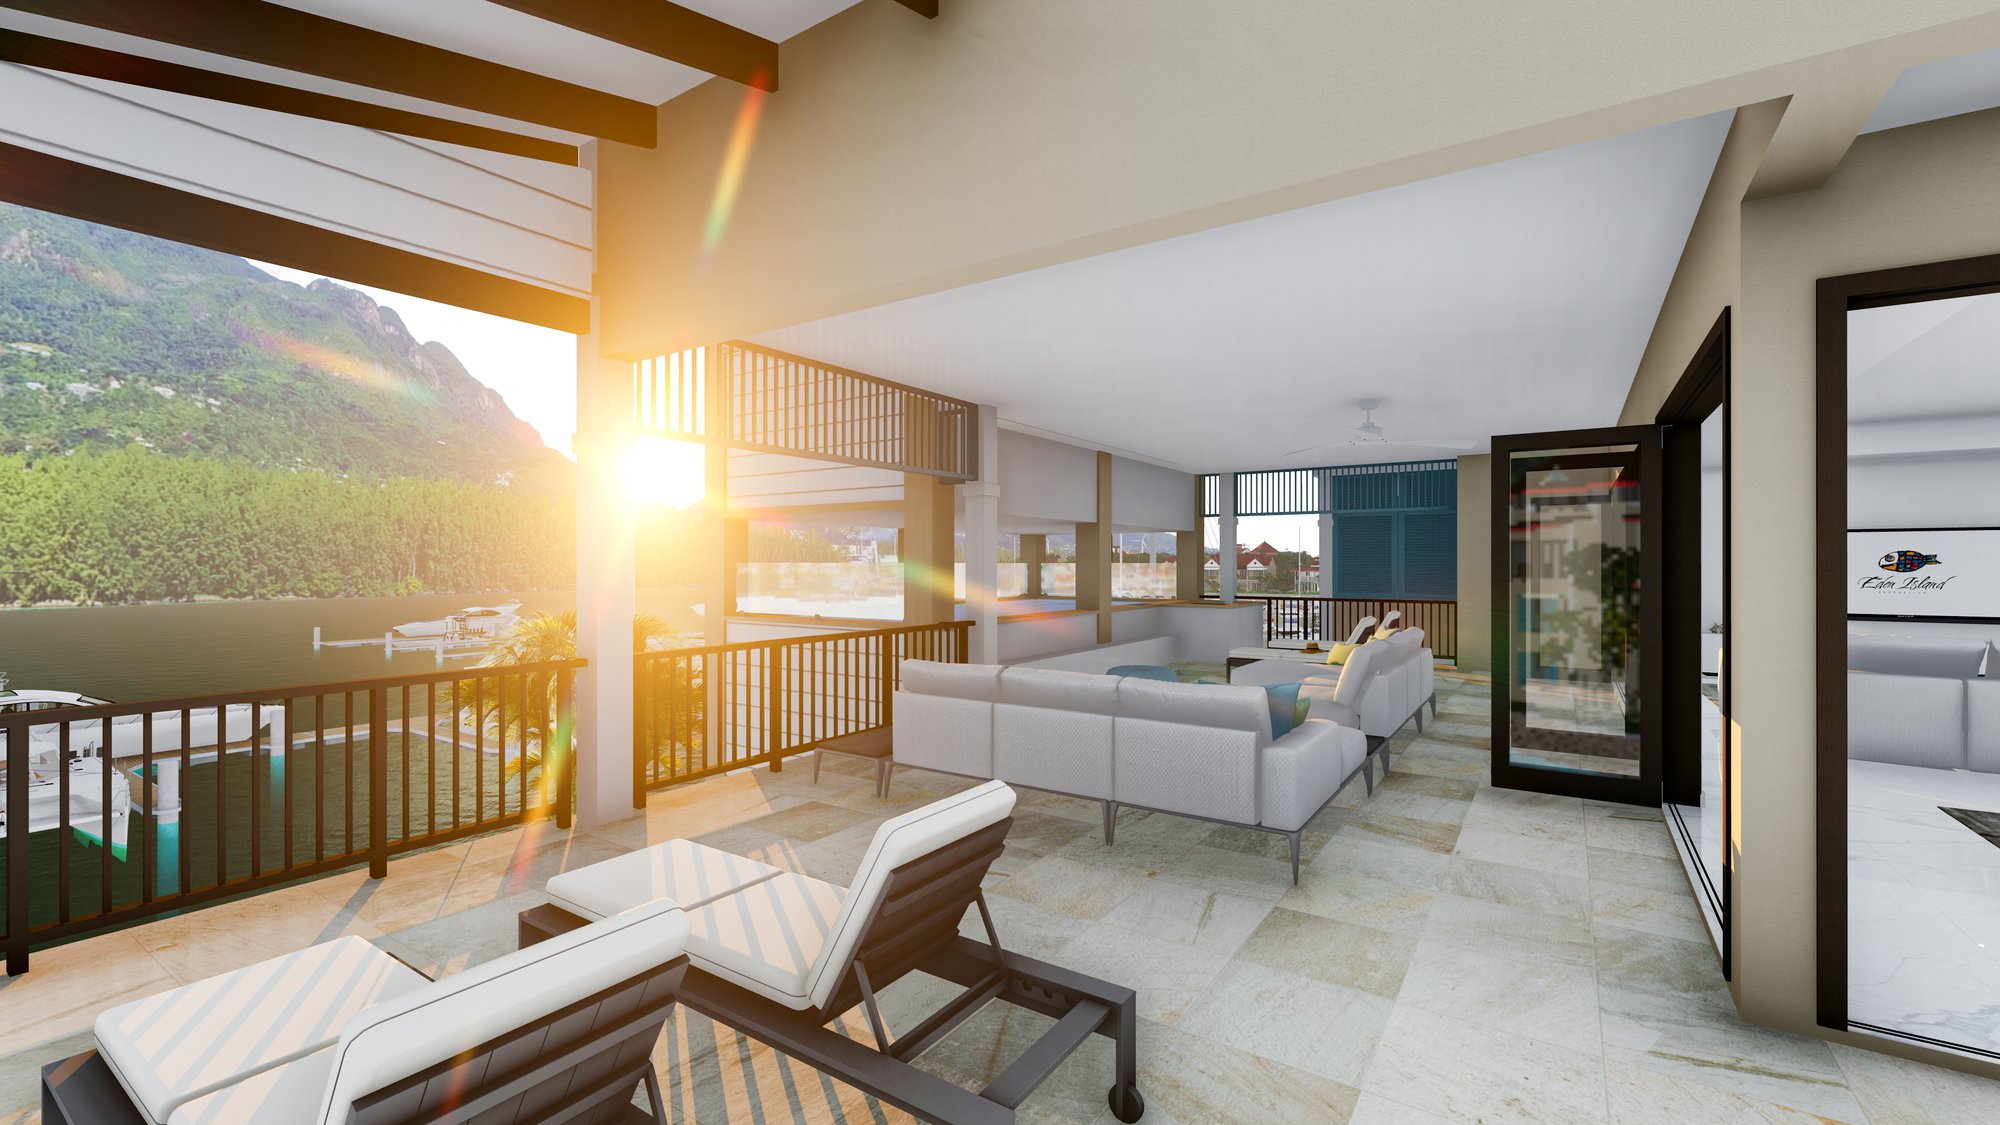 Apartment in Eden Island, Seychelles, Seychelles 1 - 10770448